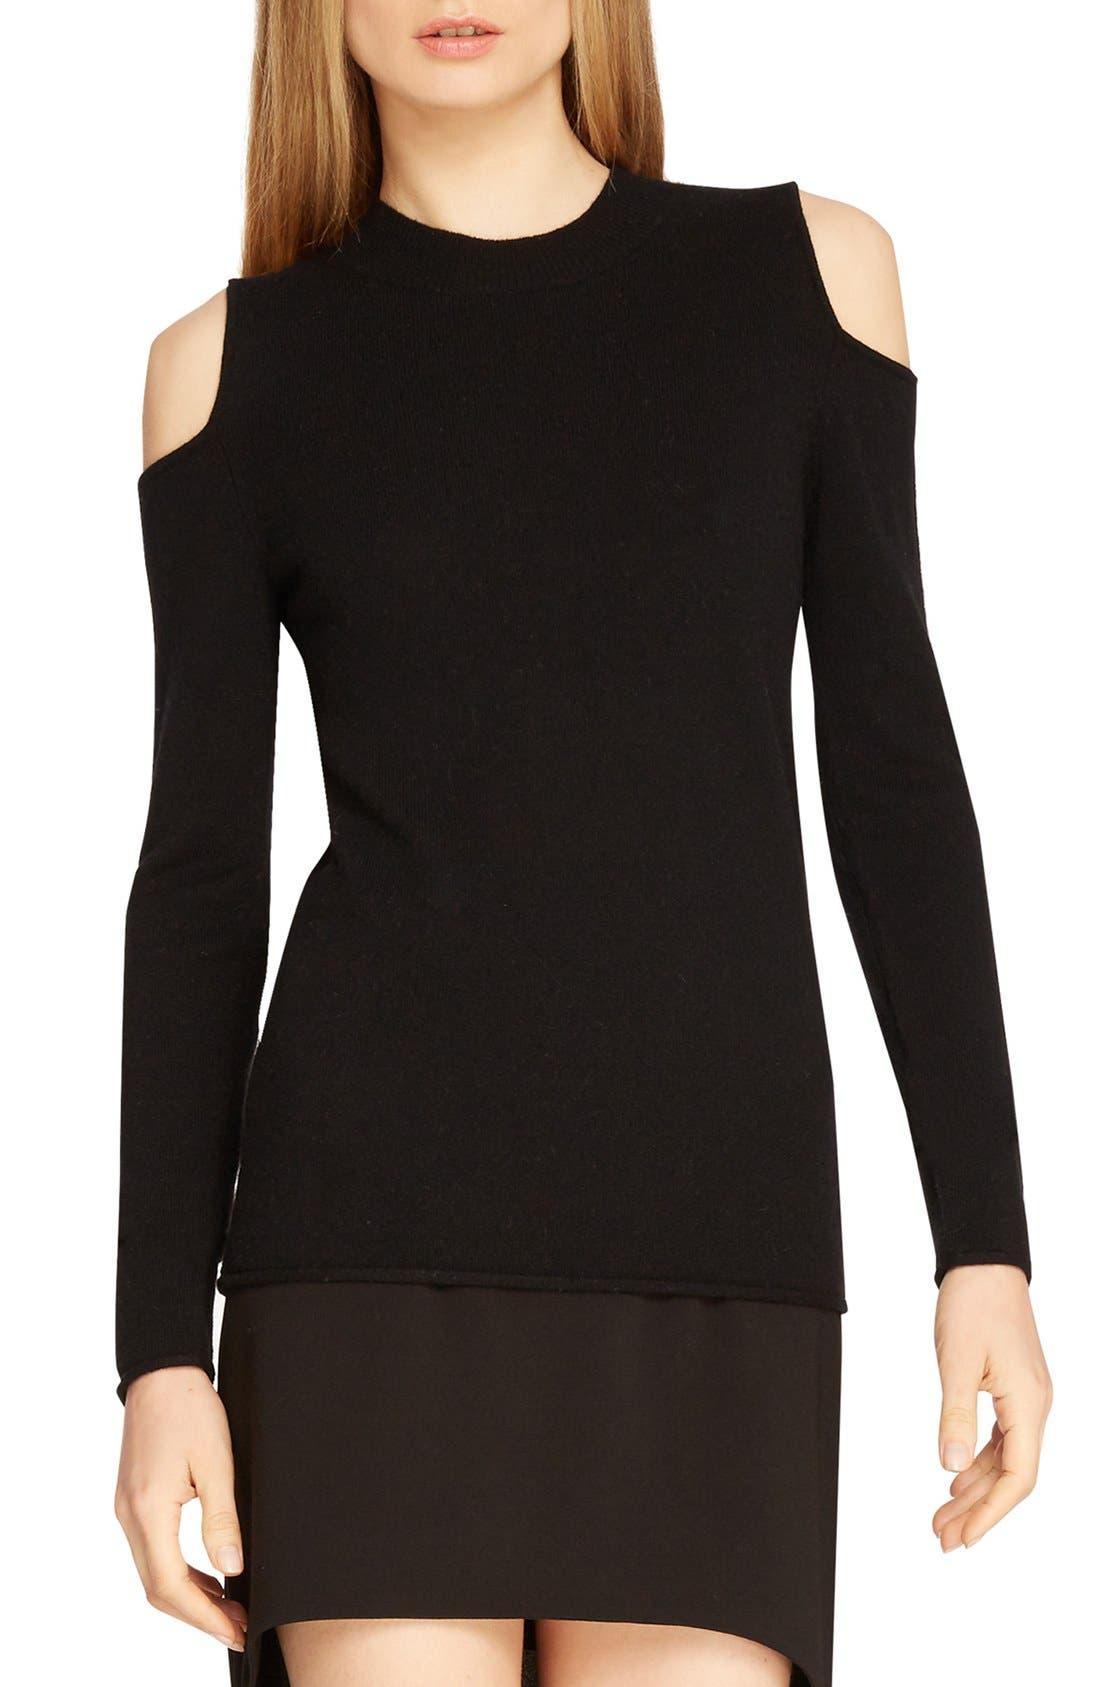 Alternate Image 1 Selected - HalstonHeritage Cutaway Shoulder Merino Wool & CashmereSweater